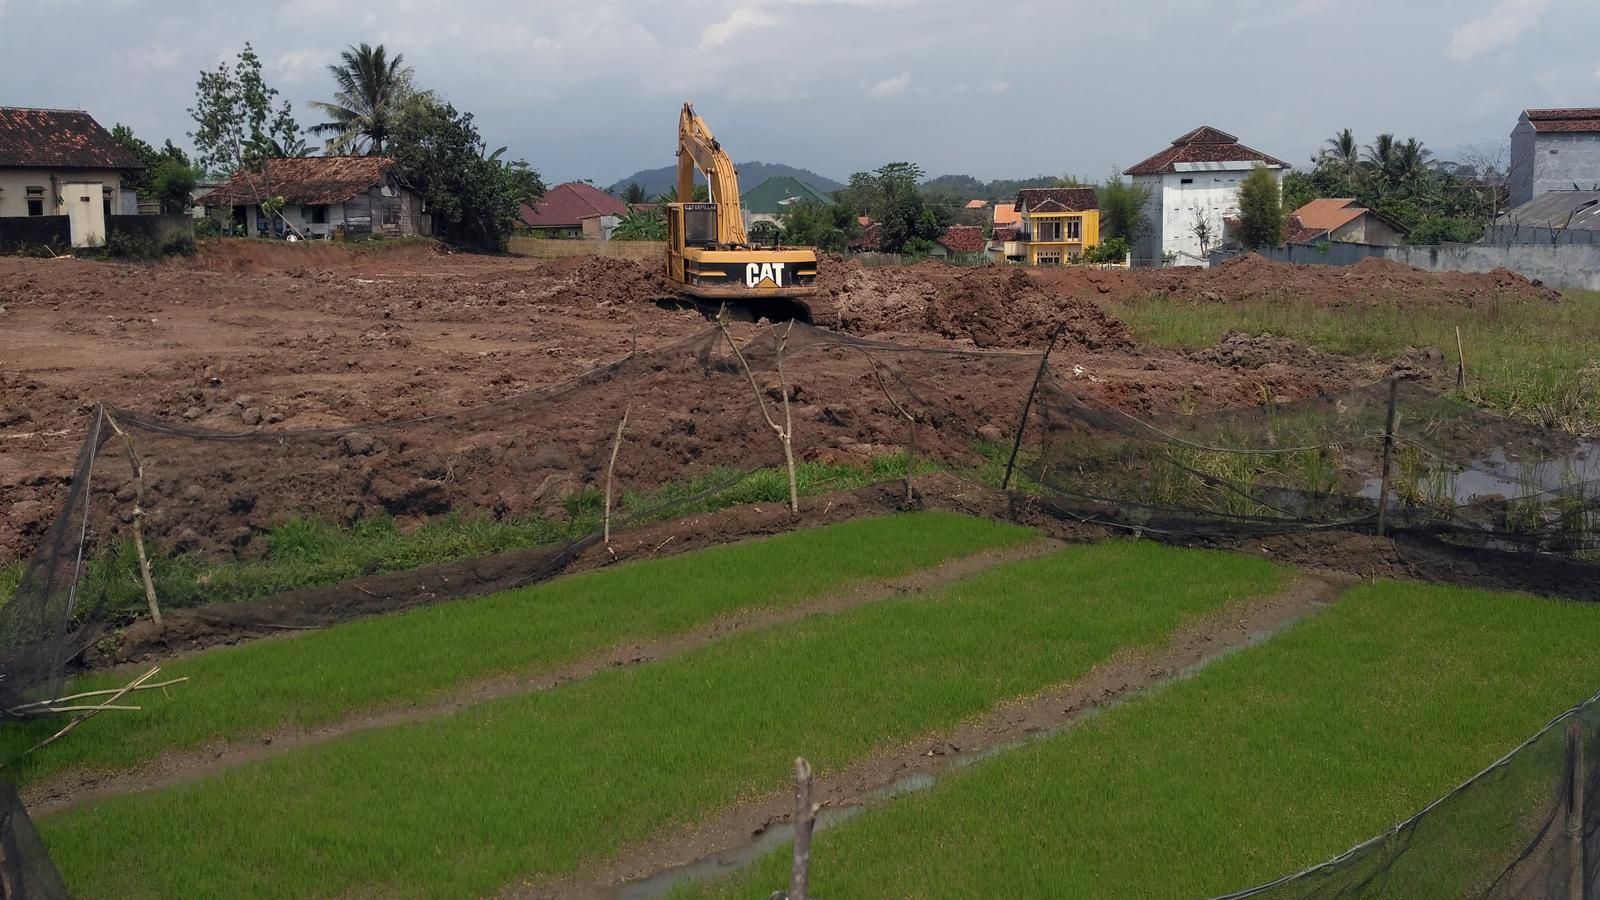 Alat berat tengah melakukan pengurukan lahan sawah di Kelurahan Pringsewu Selatan, Kecamatan Pringsewu, Kabupaten Pringsewu. Lebih kurang satu hektare lahan sawah produktif di lokasi tersebut bakal dijadikan lokasi pembangunan perumahan oleh pihak pengembang. (Lampungnews/Anton Nugroz)